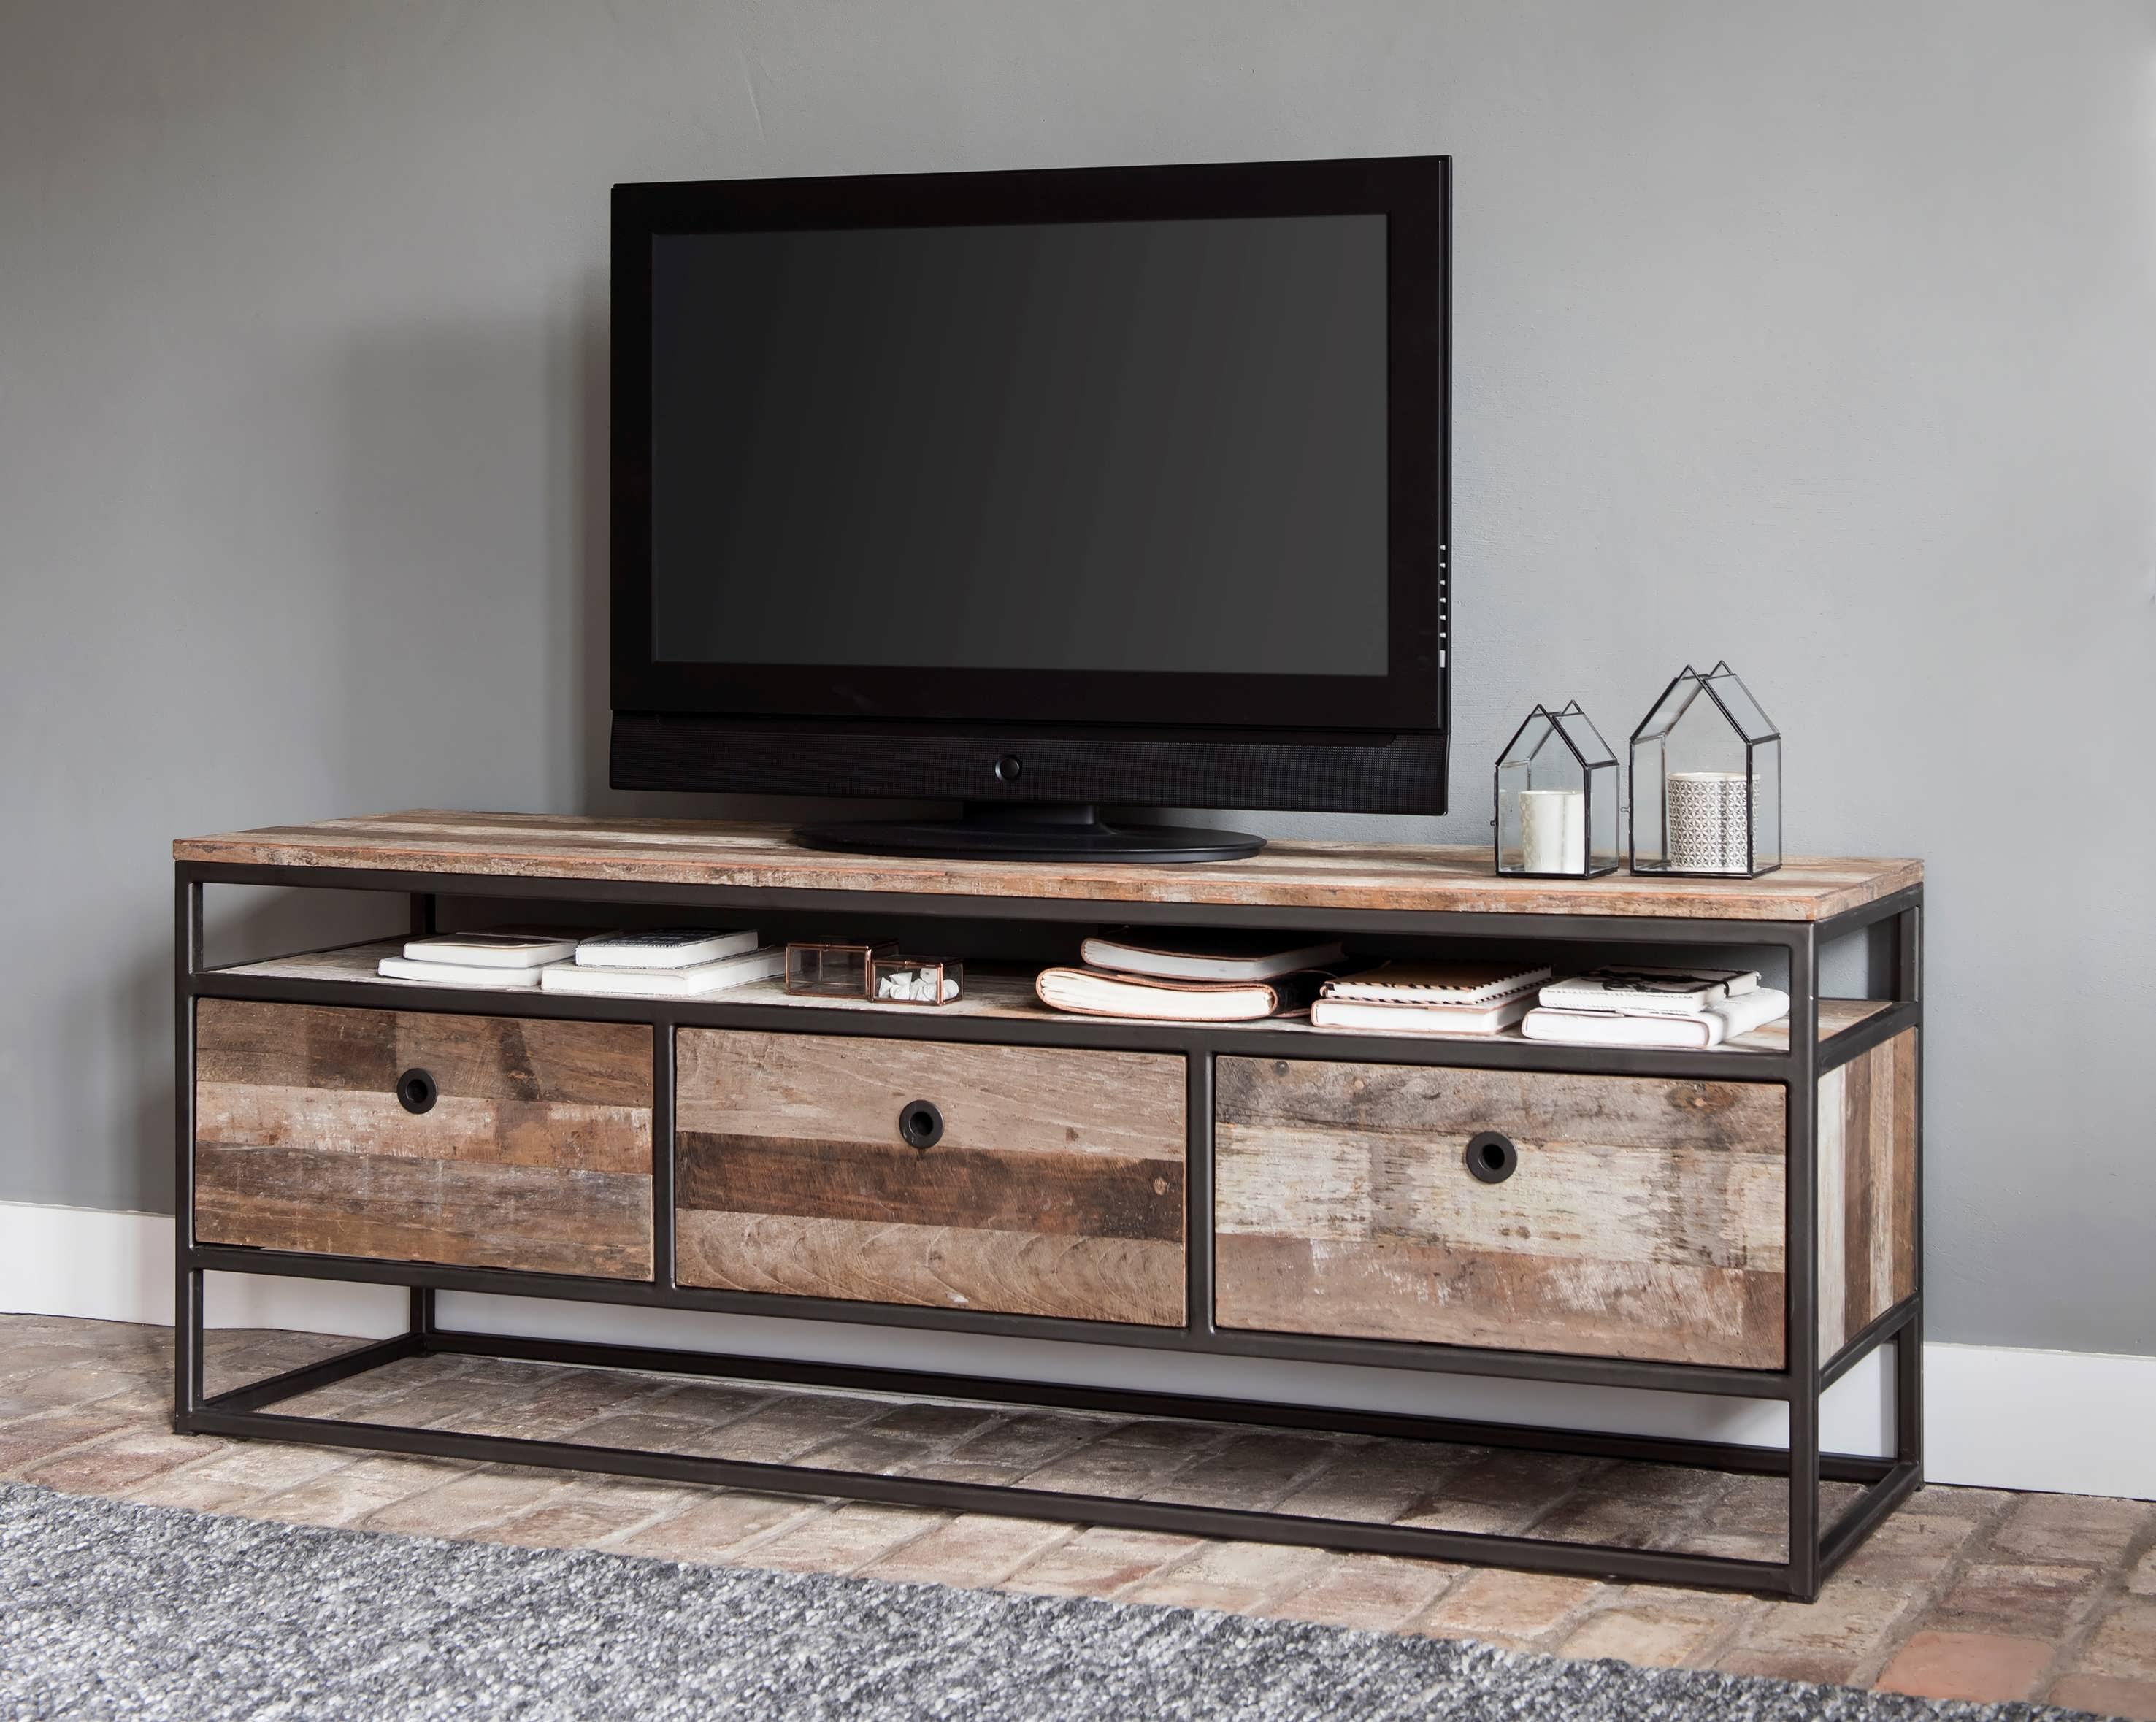 Oude Houten Kast : Industrieel tv meubel orleans van recycled teak robuustetafels.nl